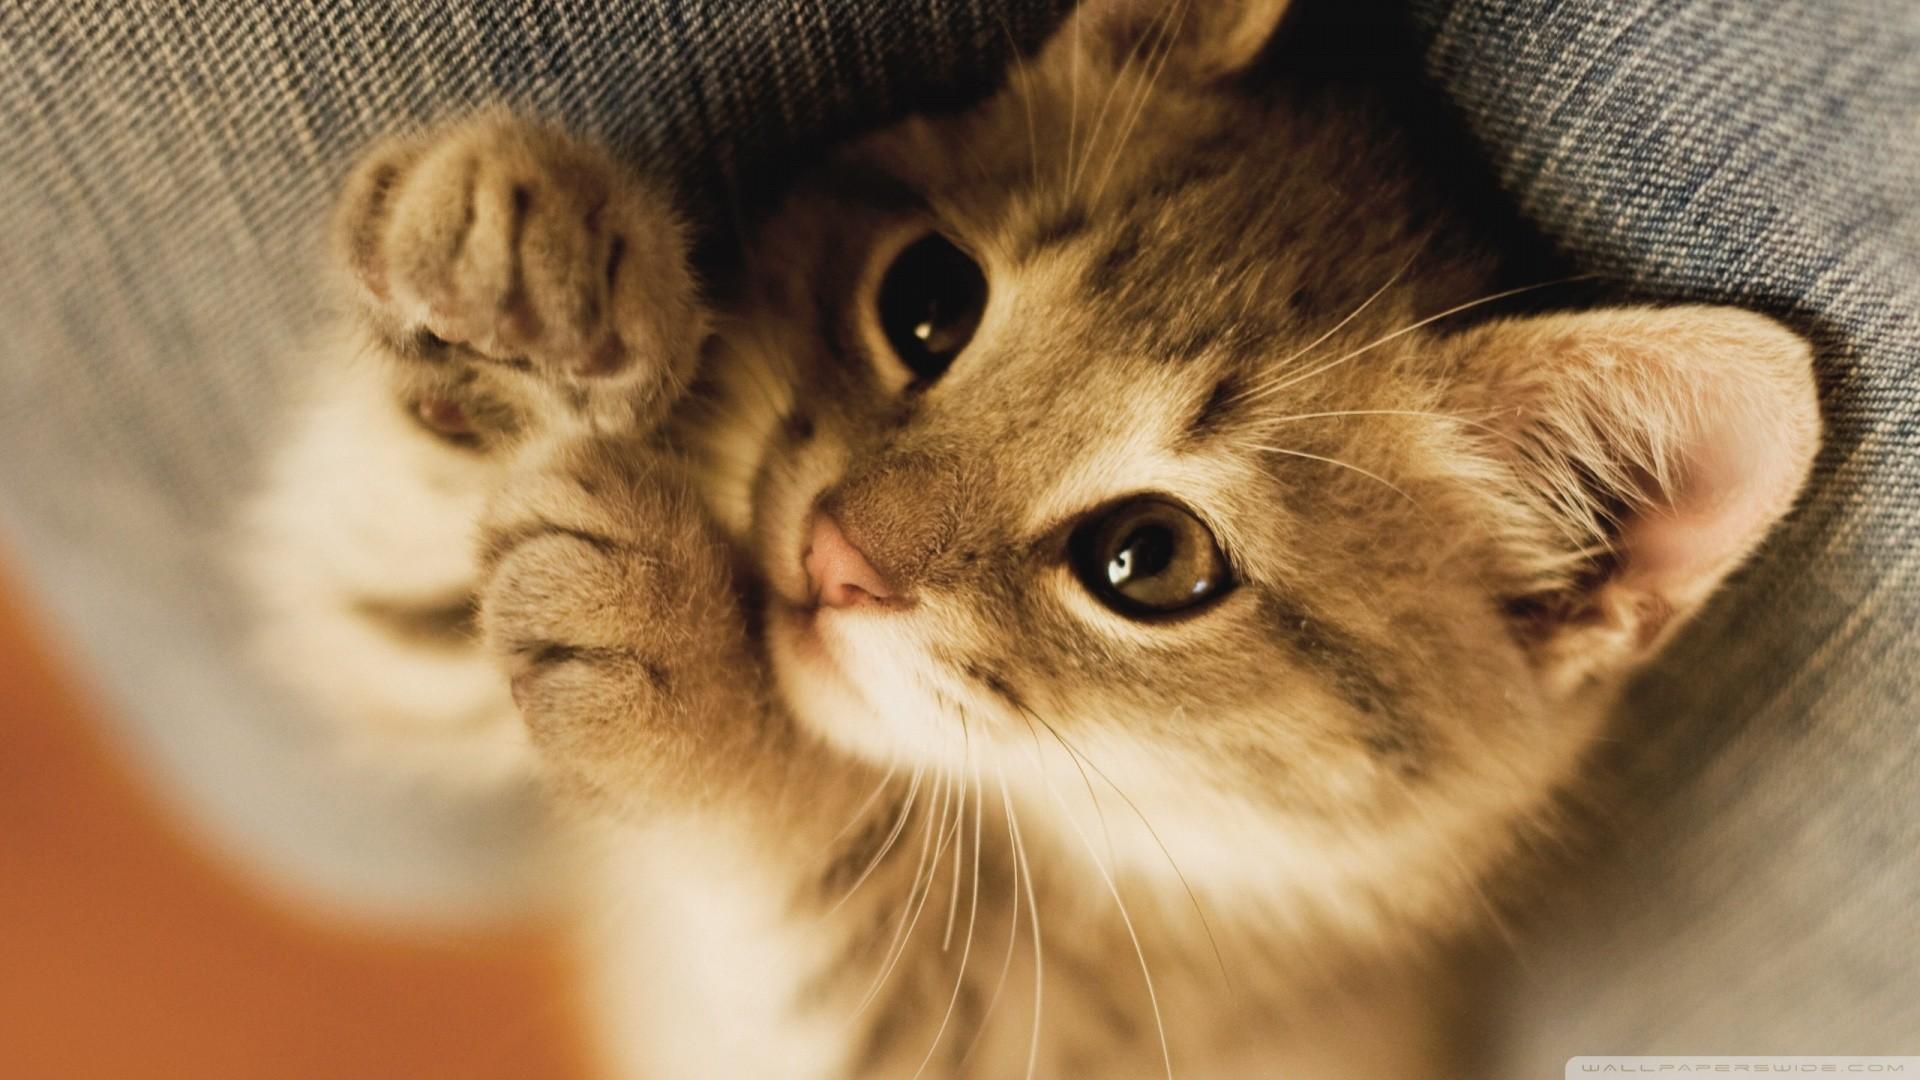 2133x1200 German Shepherd Dog Puppy Kitten Katty HD Wallpaper